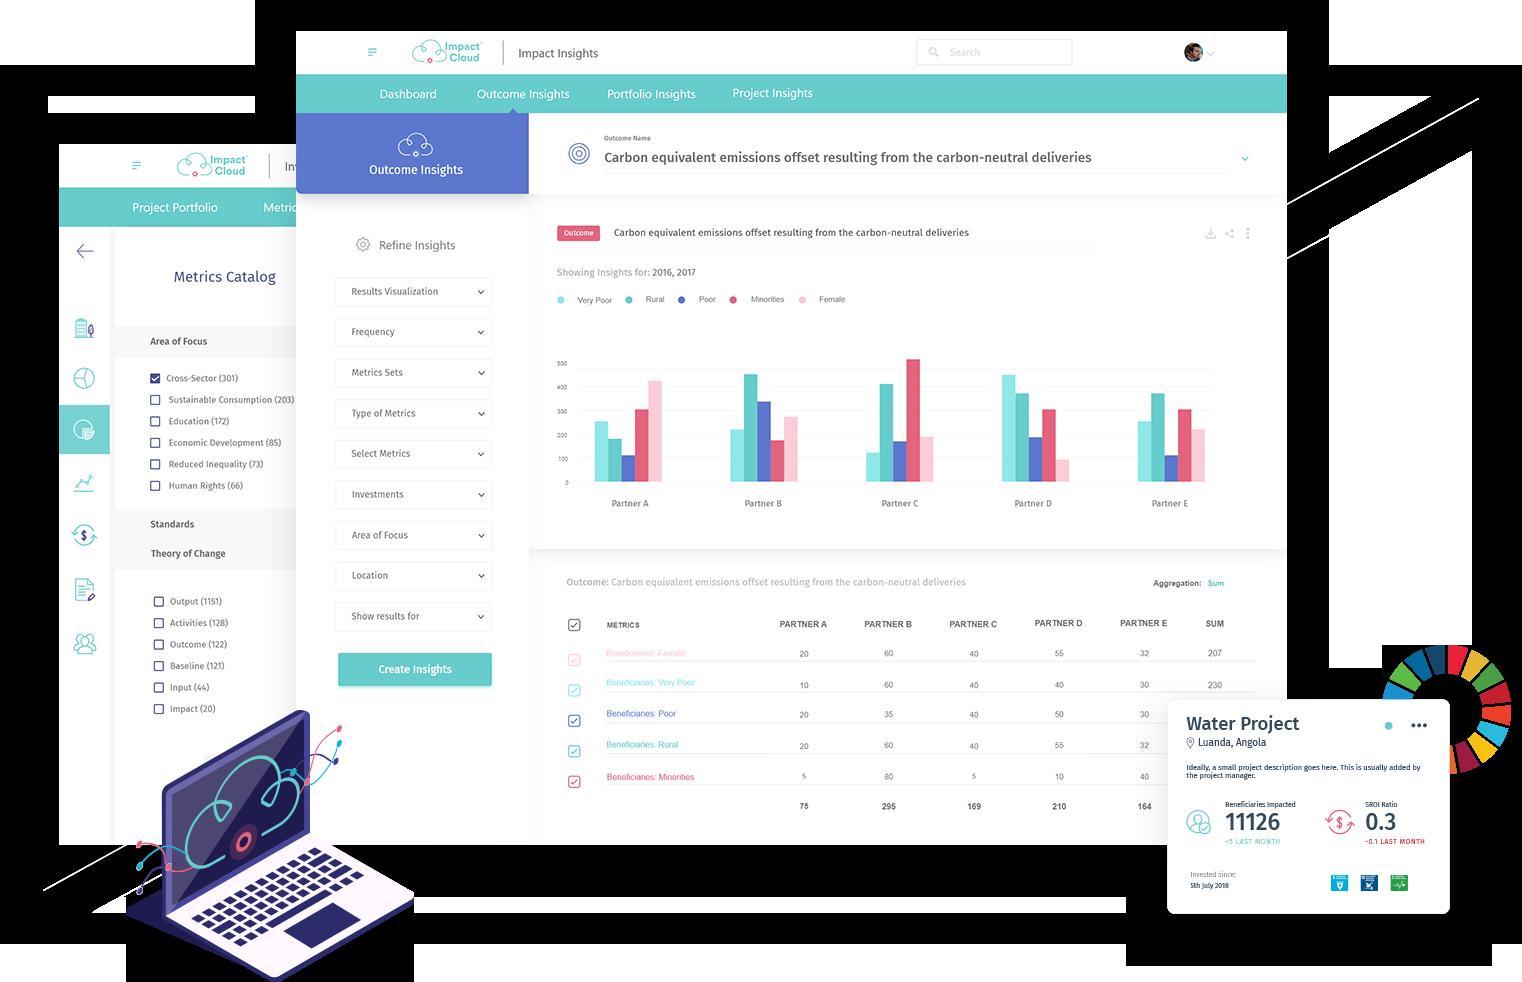 Monitoring & Evaluation Tools